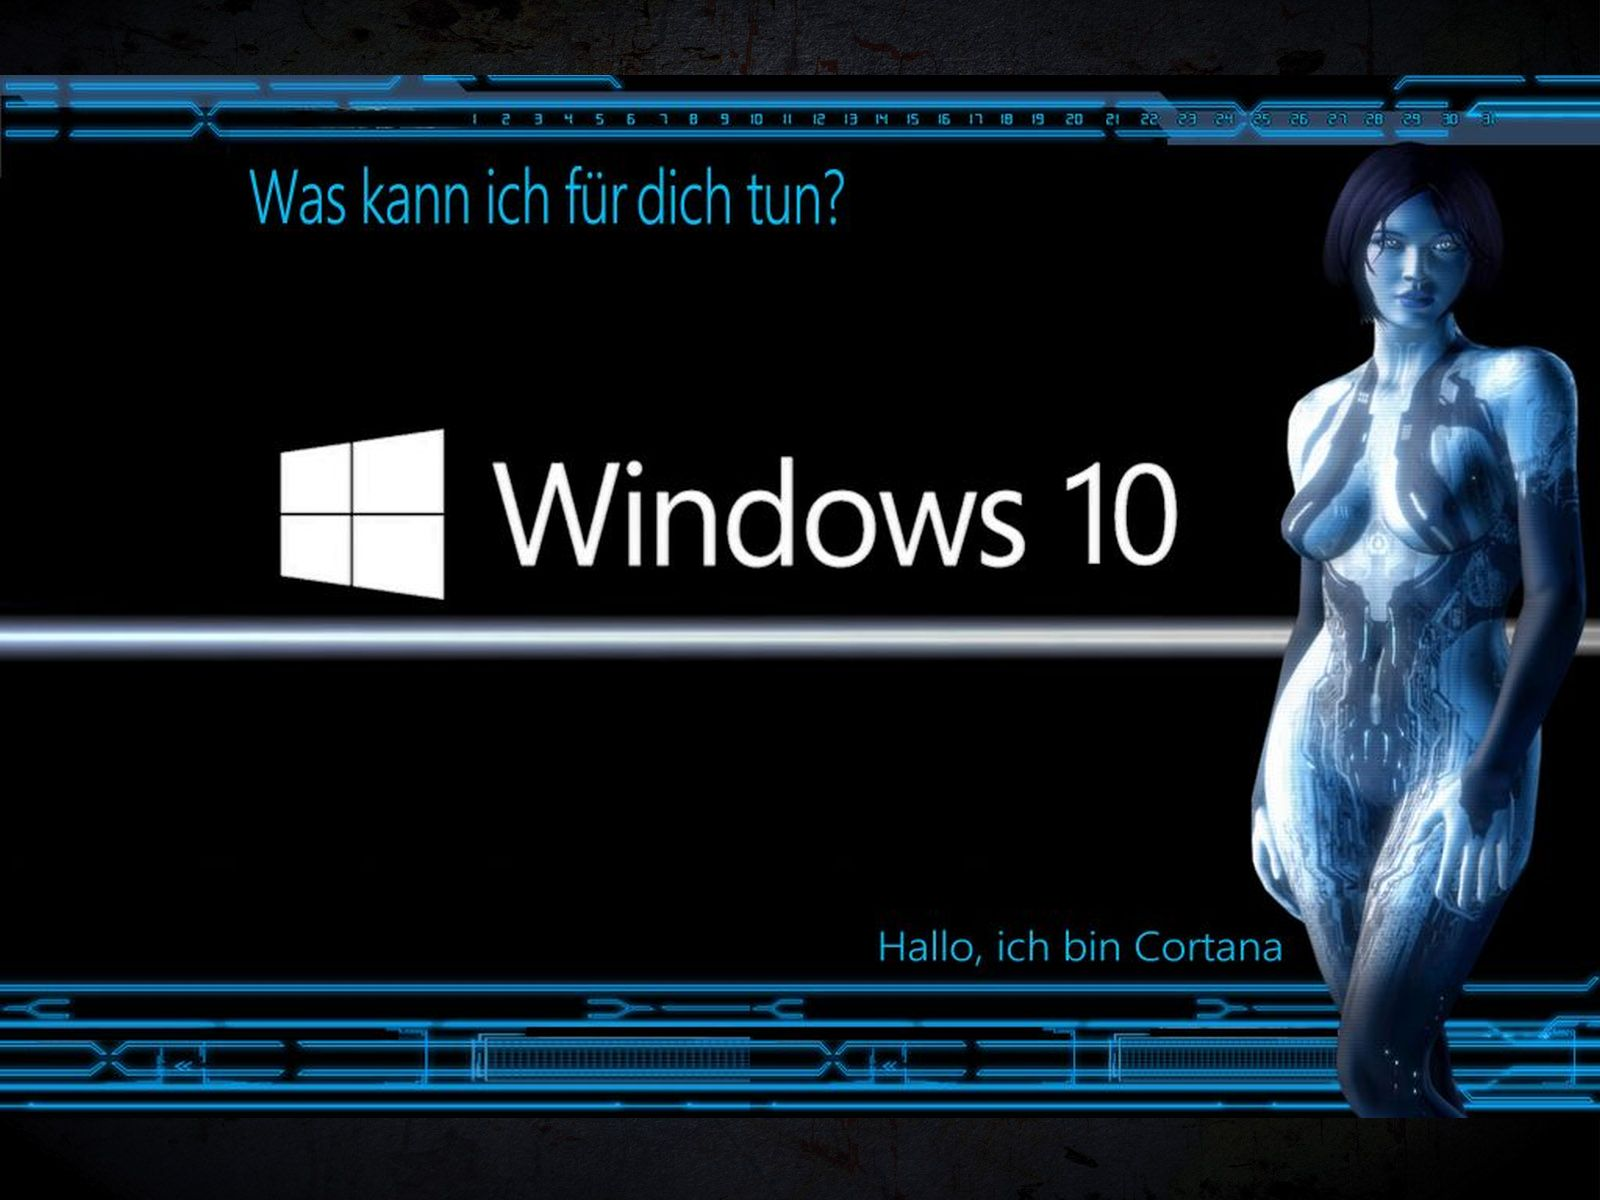 Cortana Animated Wallpaper Windows 10 Wallpapersafari